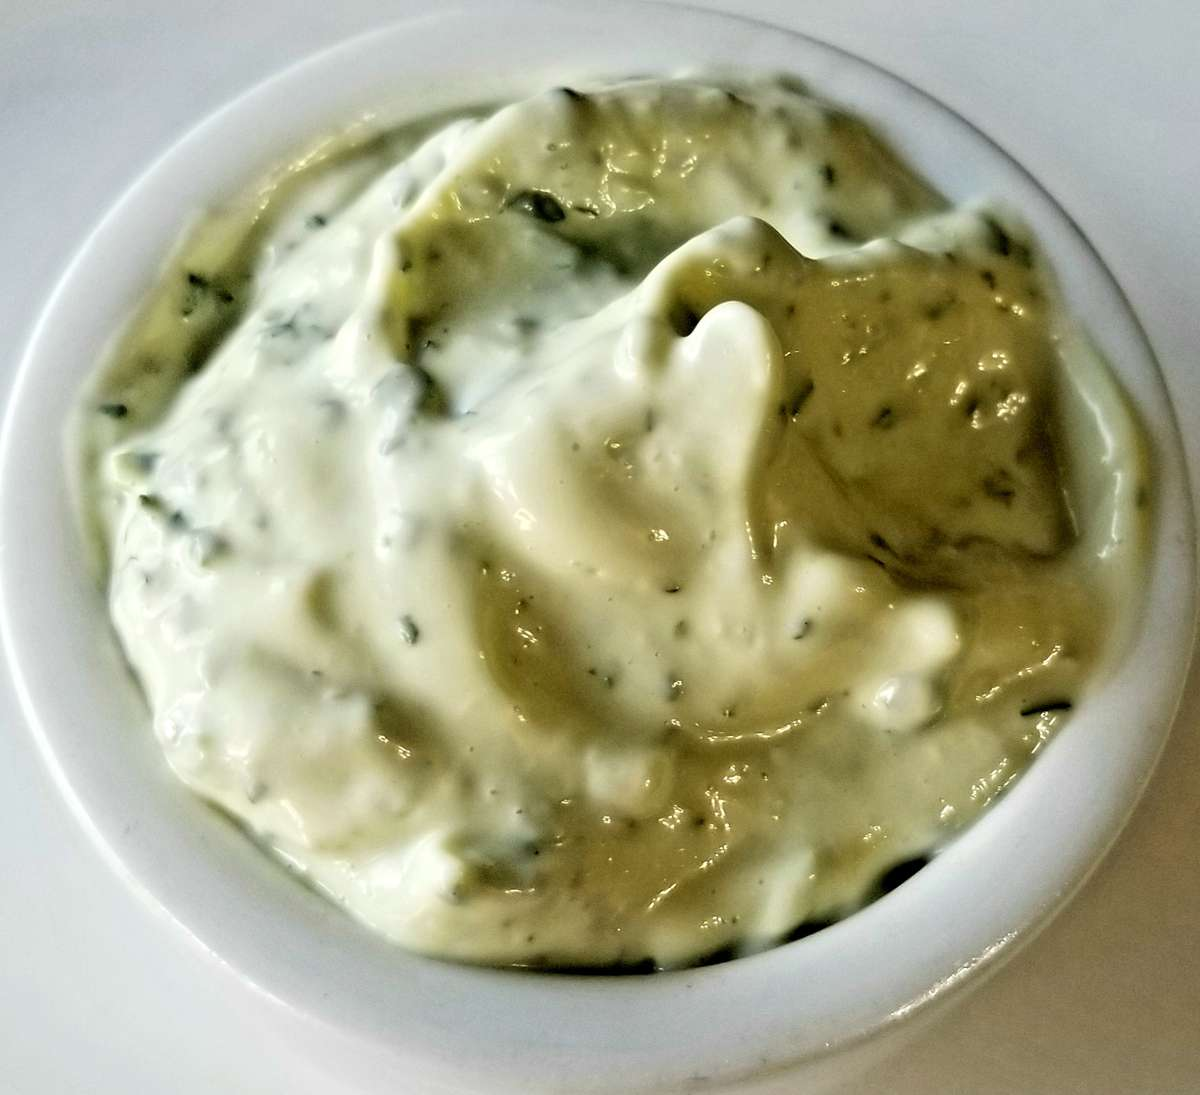 5 oz Jar Geo's Garlic Cilantro Aioli